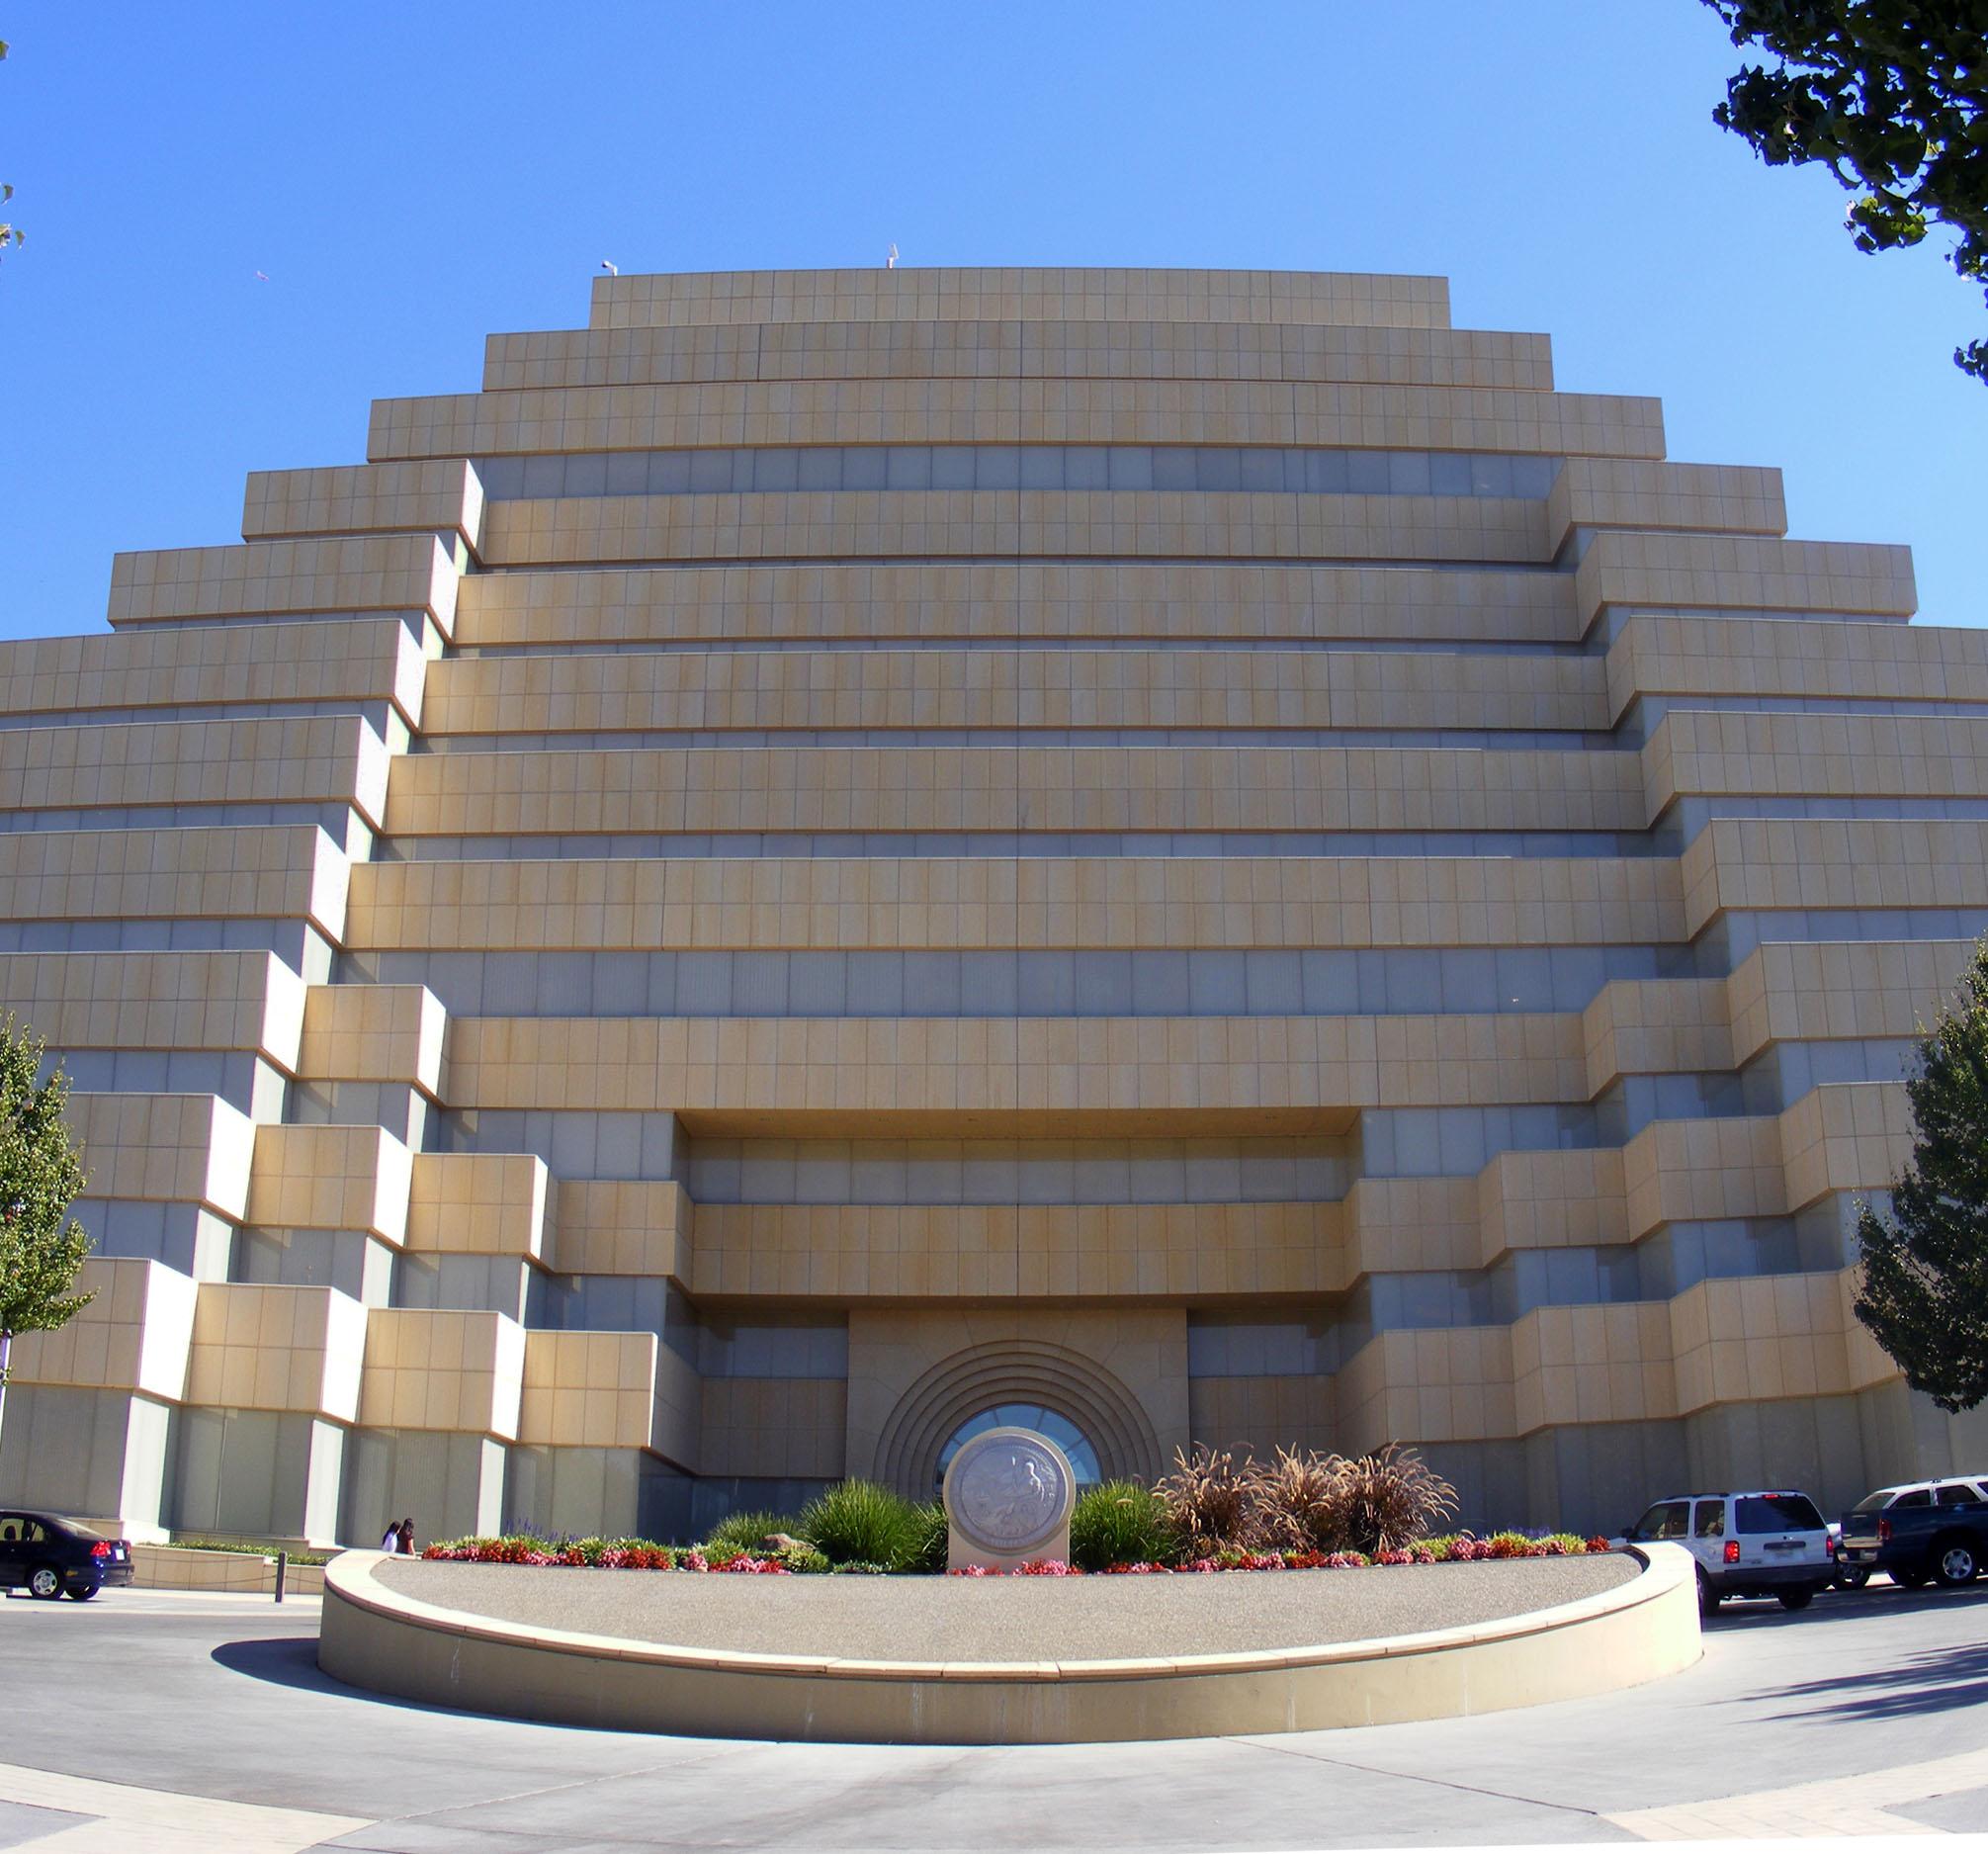 filethe ziggurat in west sacramento cajpg wikimedia